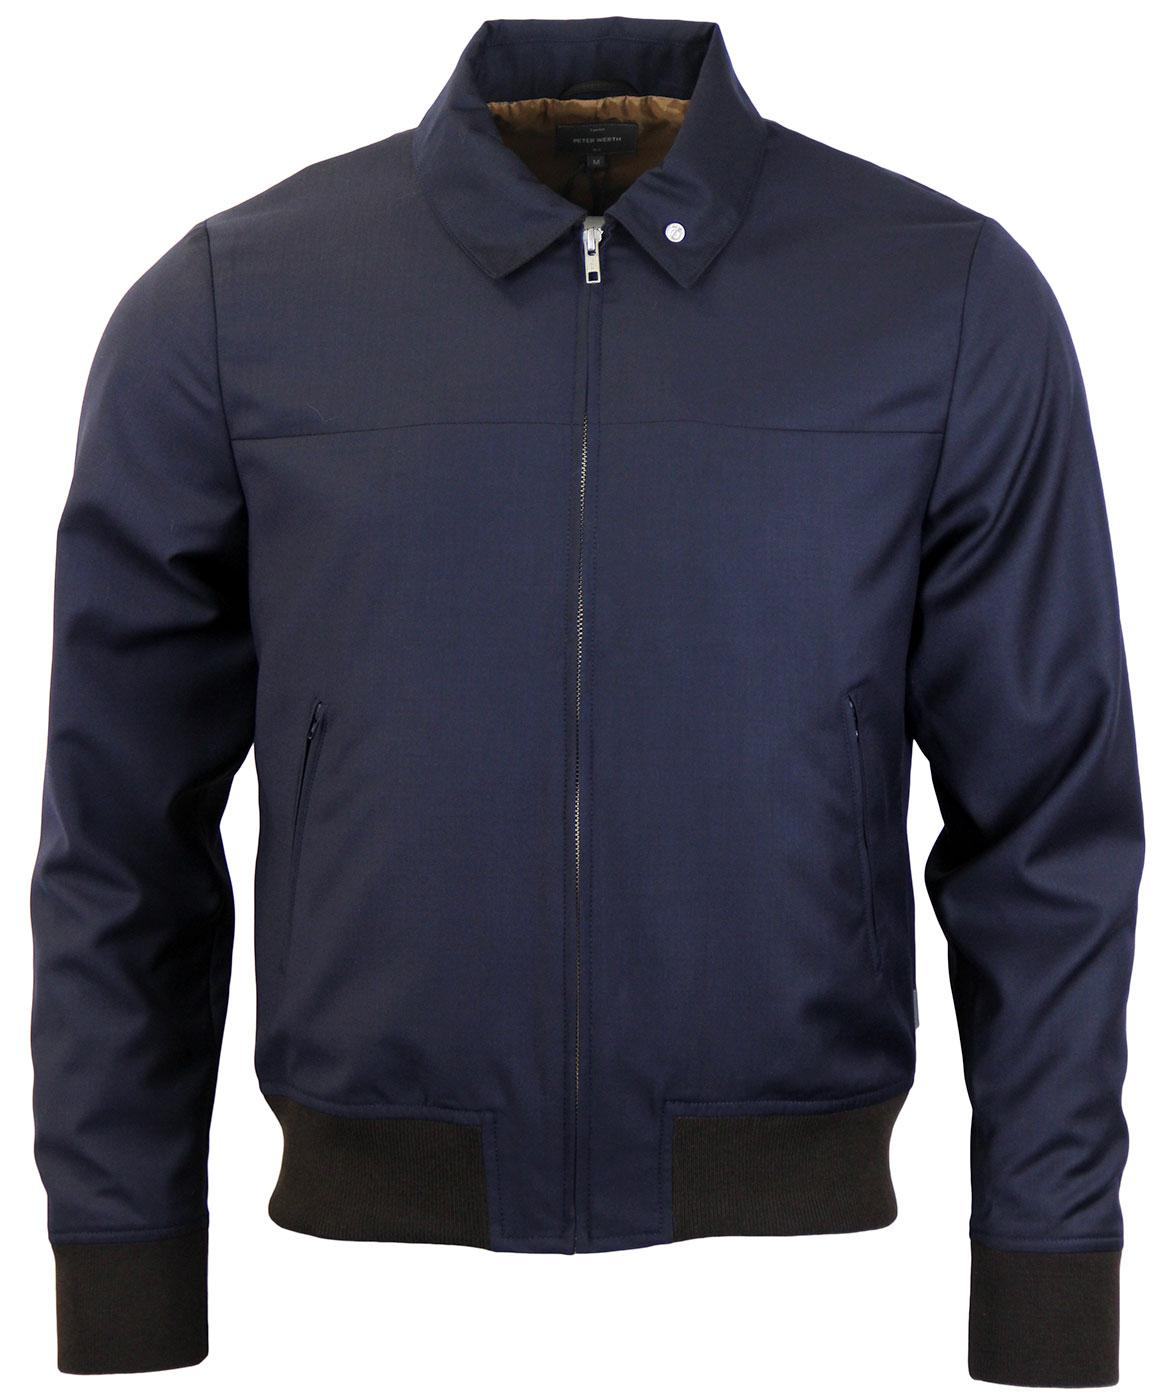 Eckford PETER WERTH Light Blouson Tailored Jacket